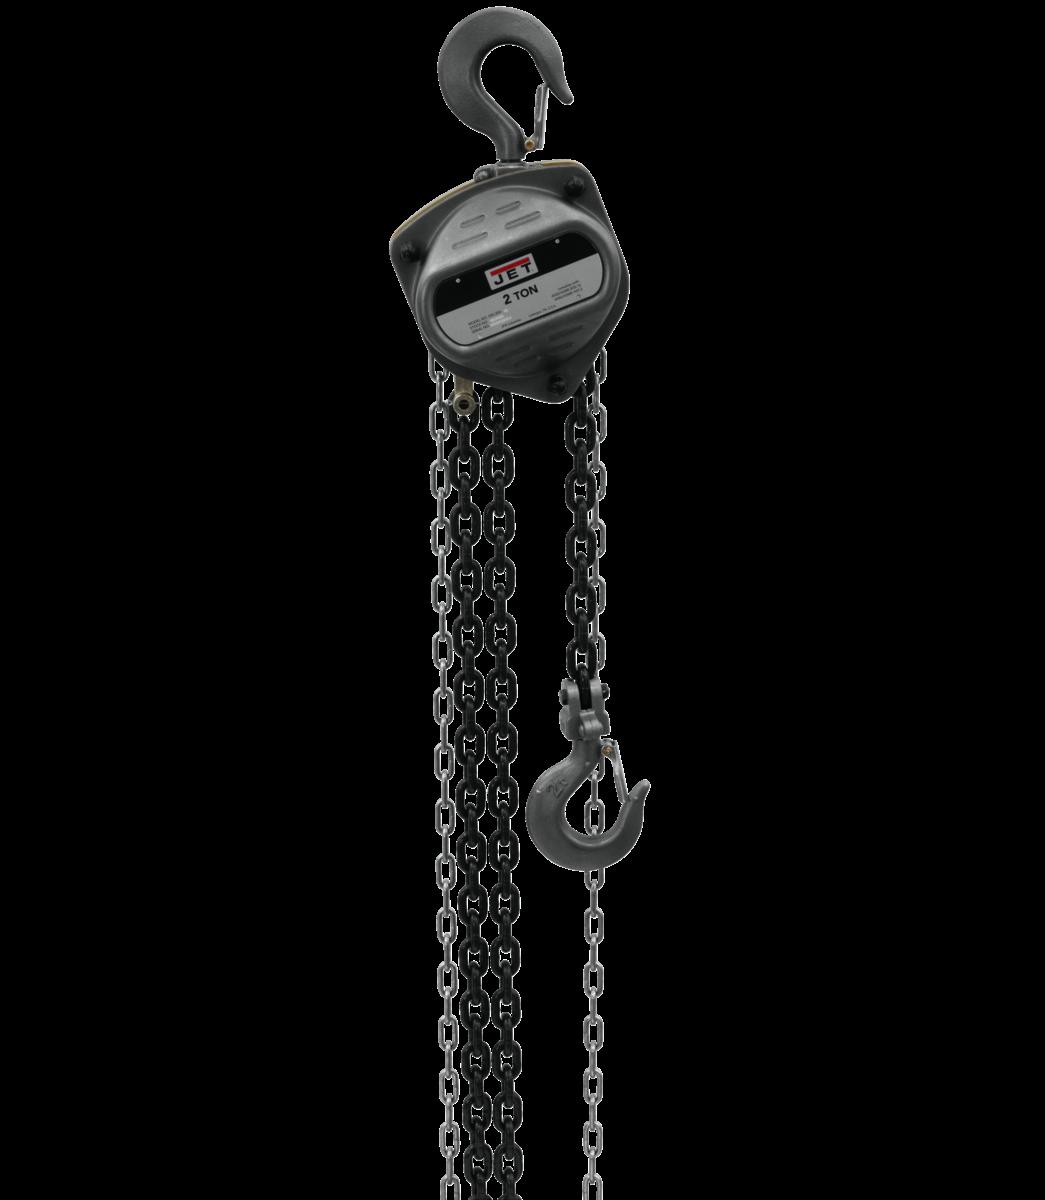 S90-200-10, 2-Ton Hand Chain Hoist With 10' Lift